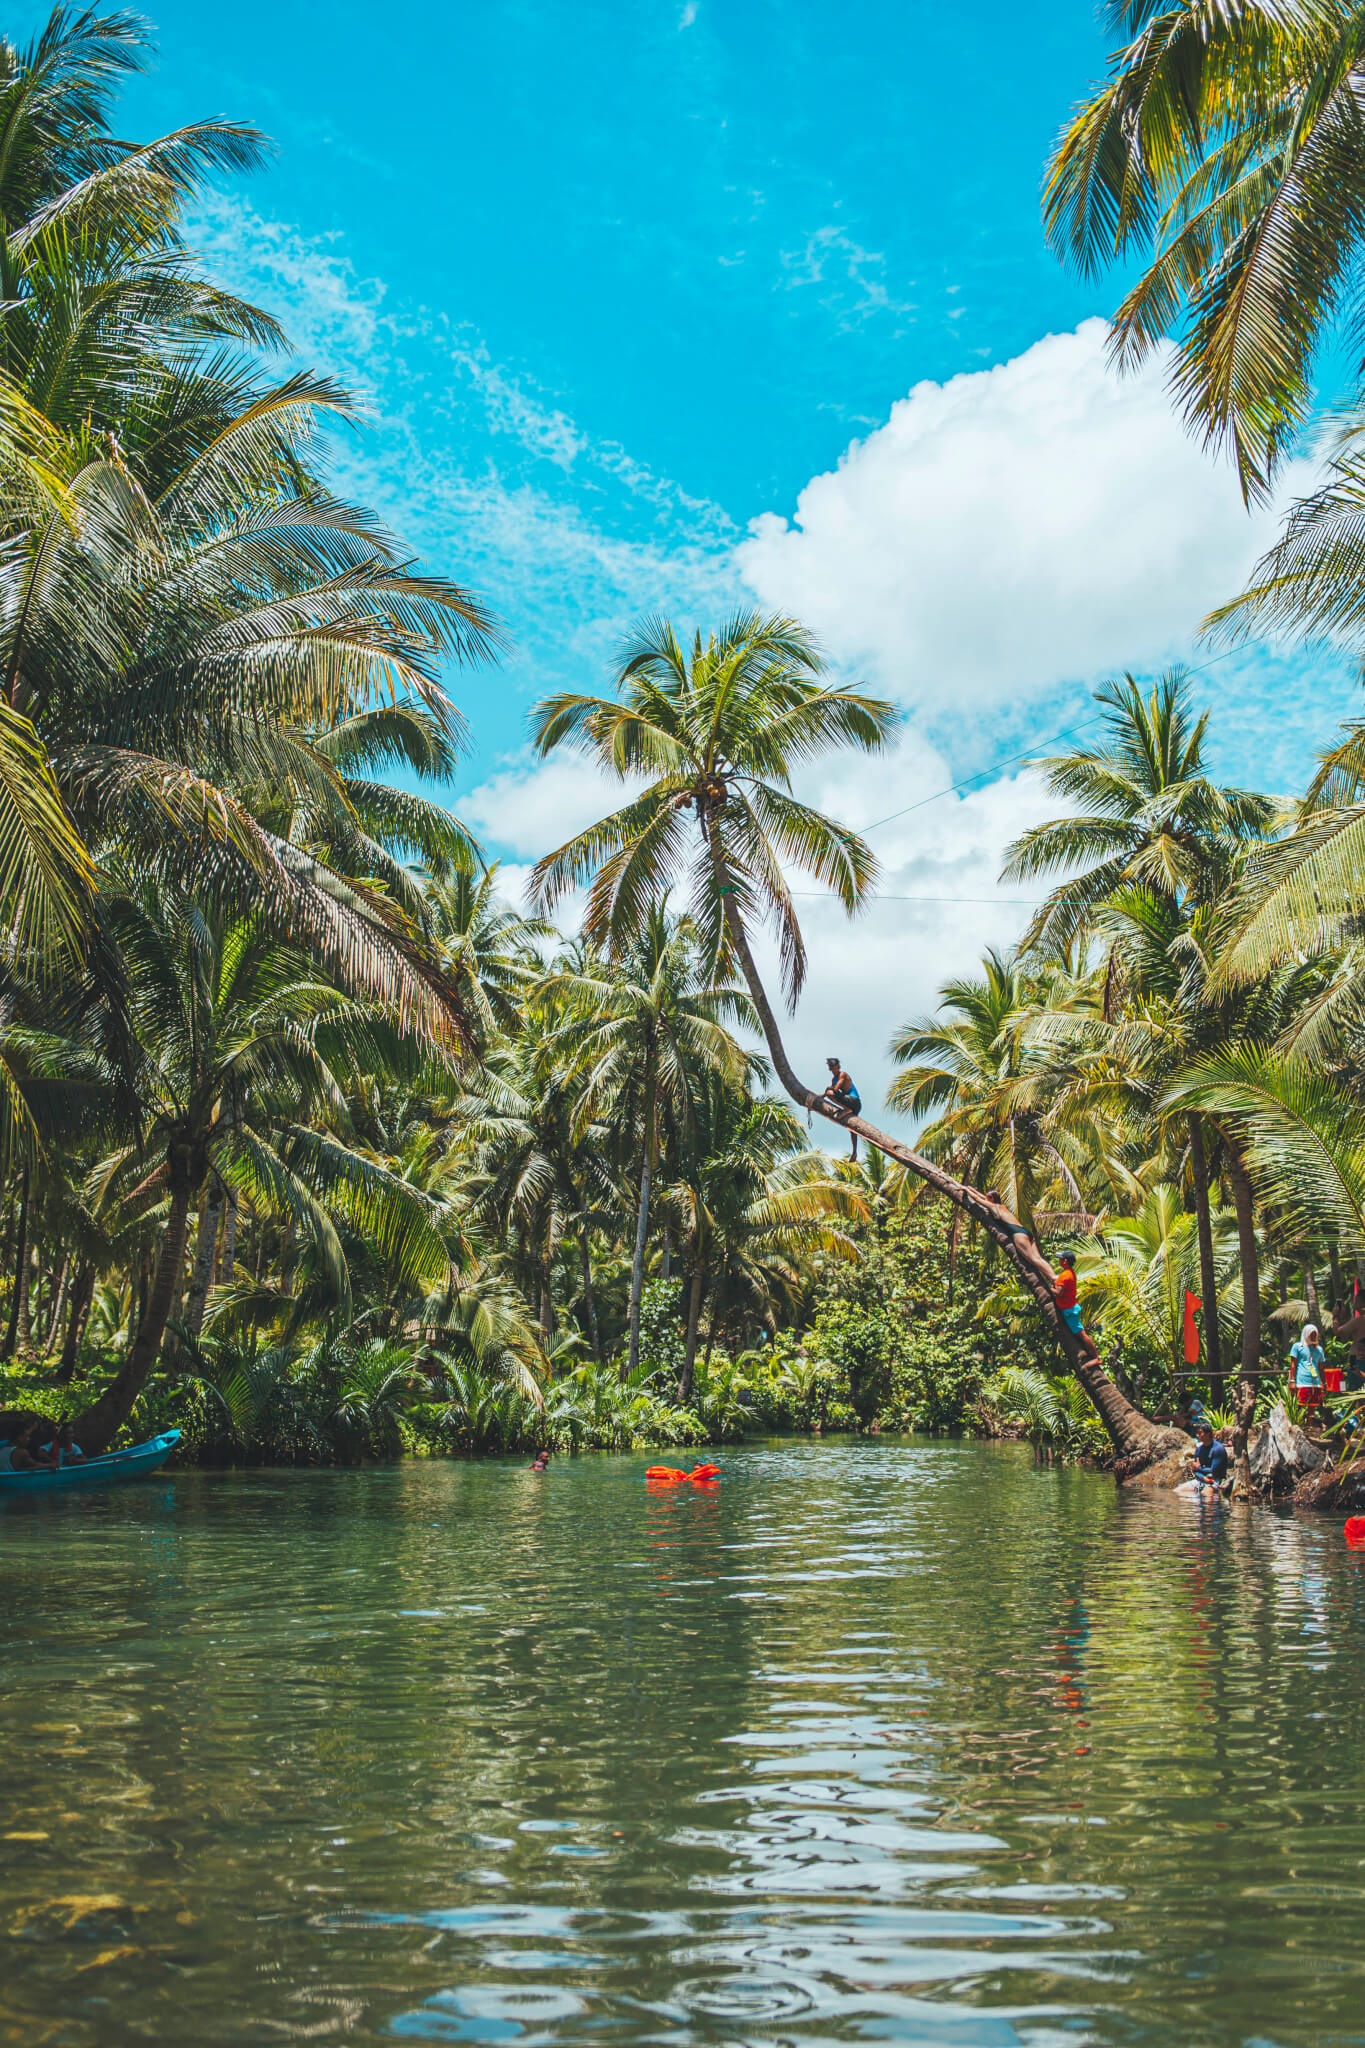 Bent coconut tree over the Maasin river